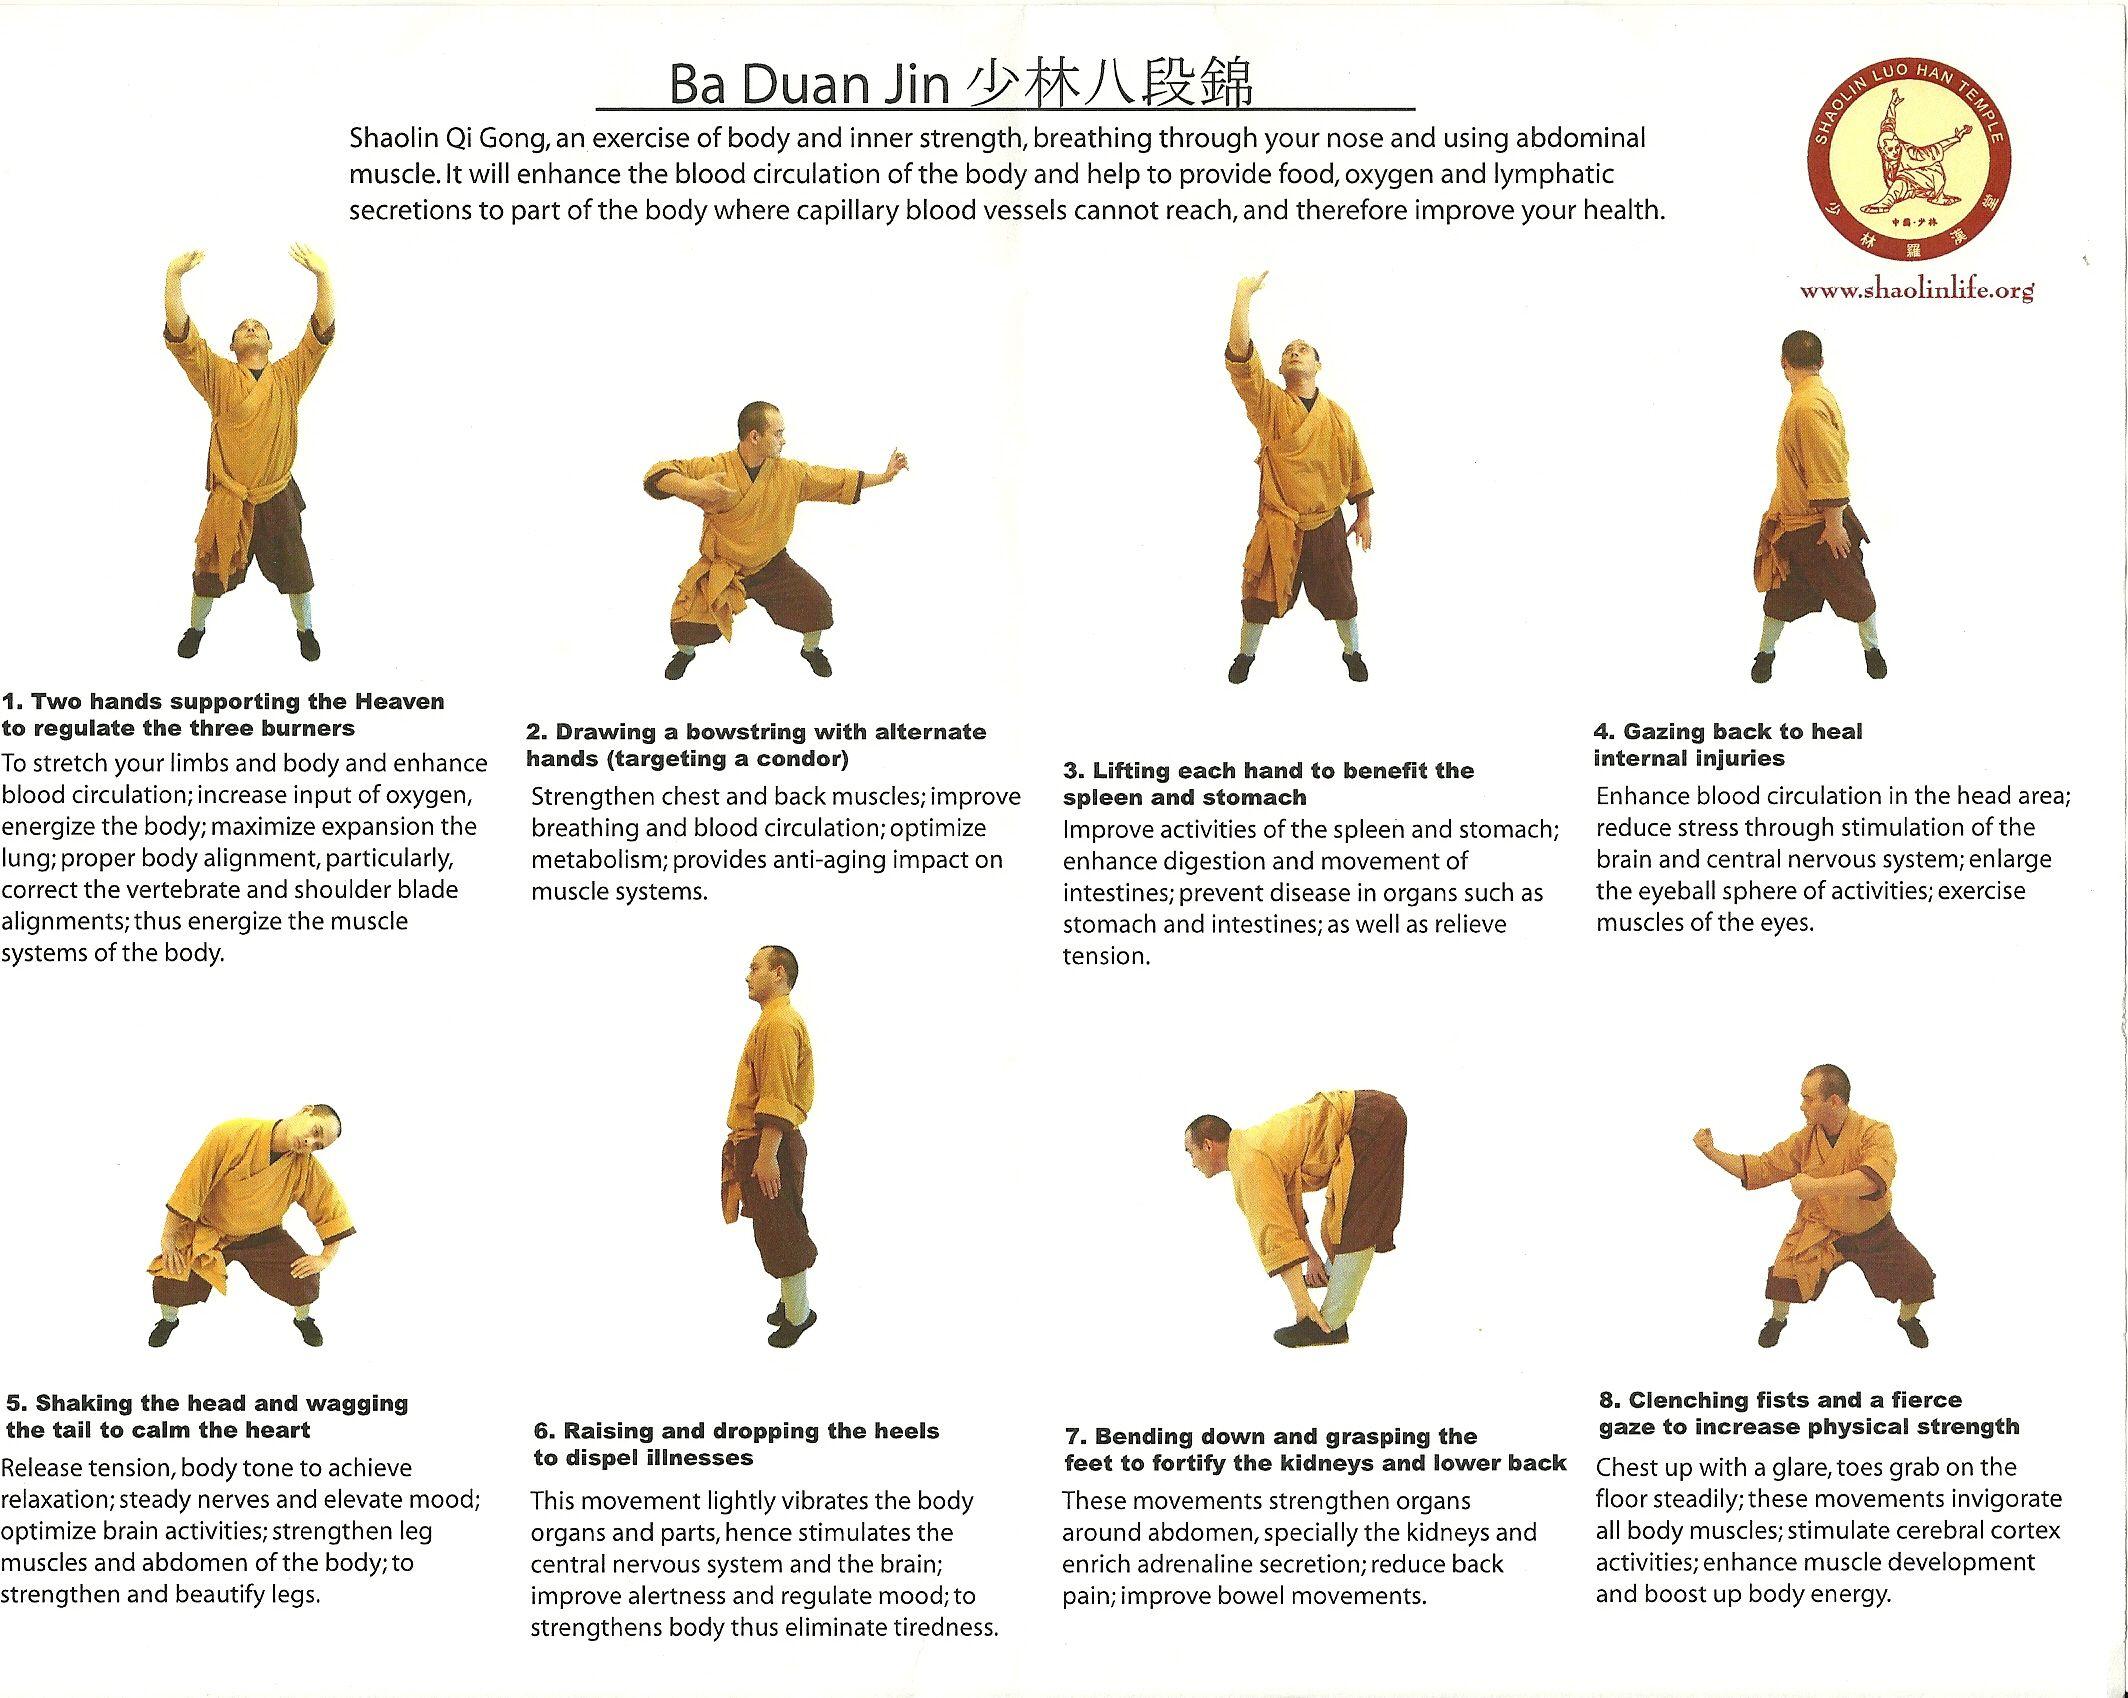 tai chi qigong kung fu qi gong karate best ab workout ab workouts ...